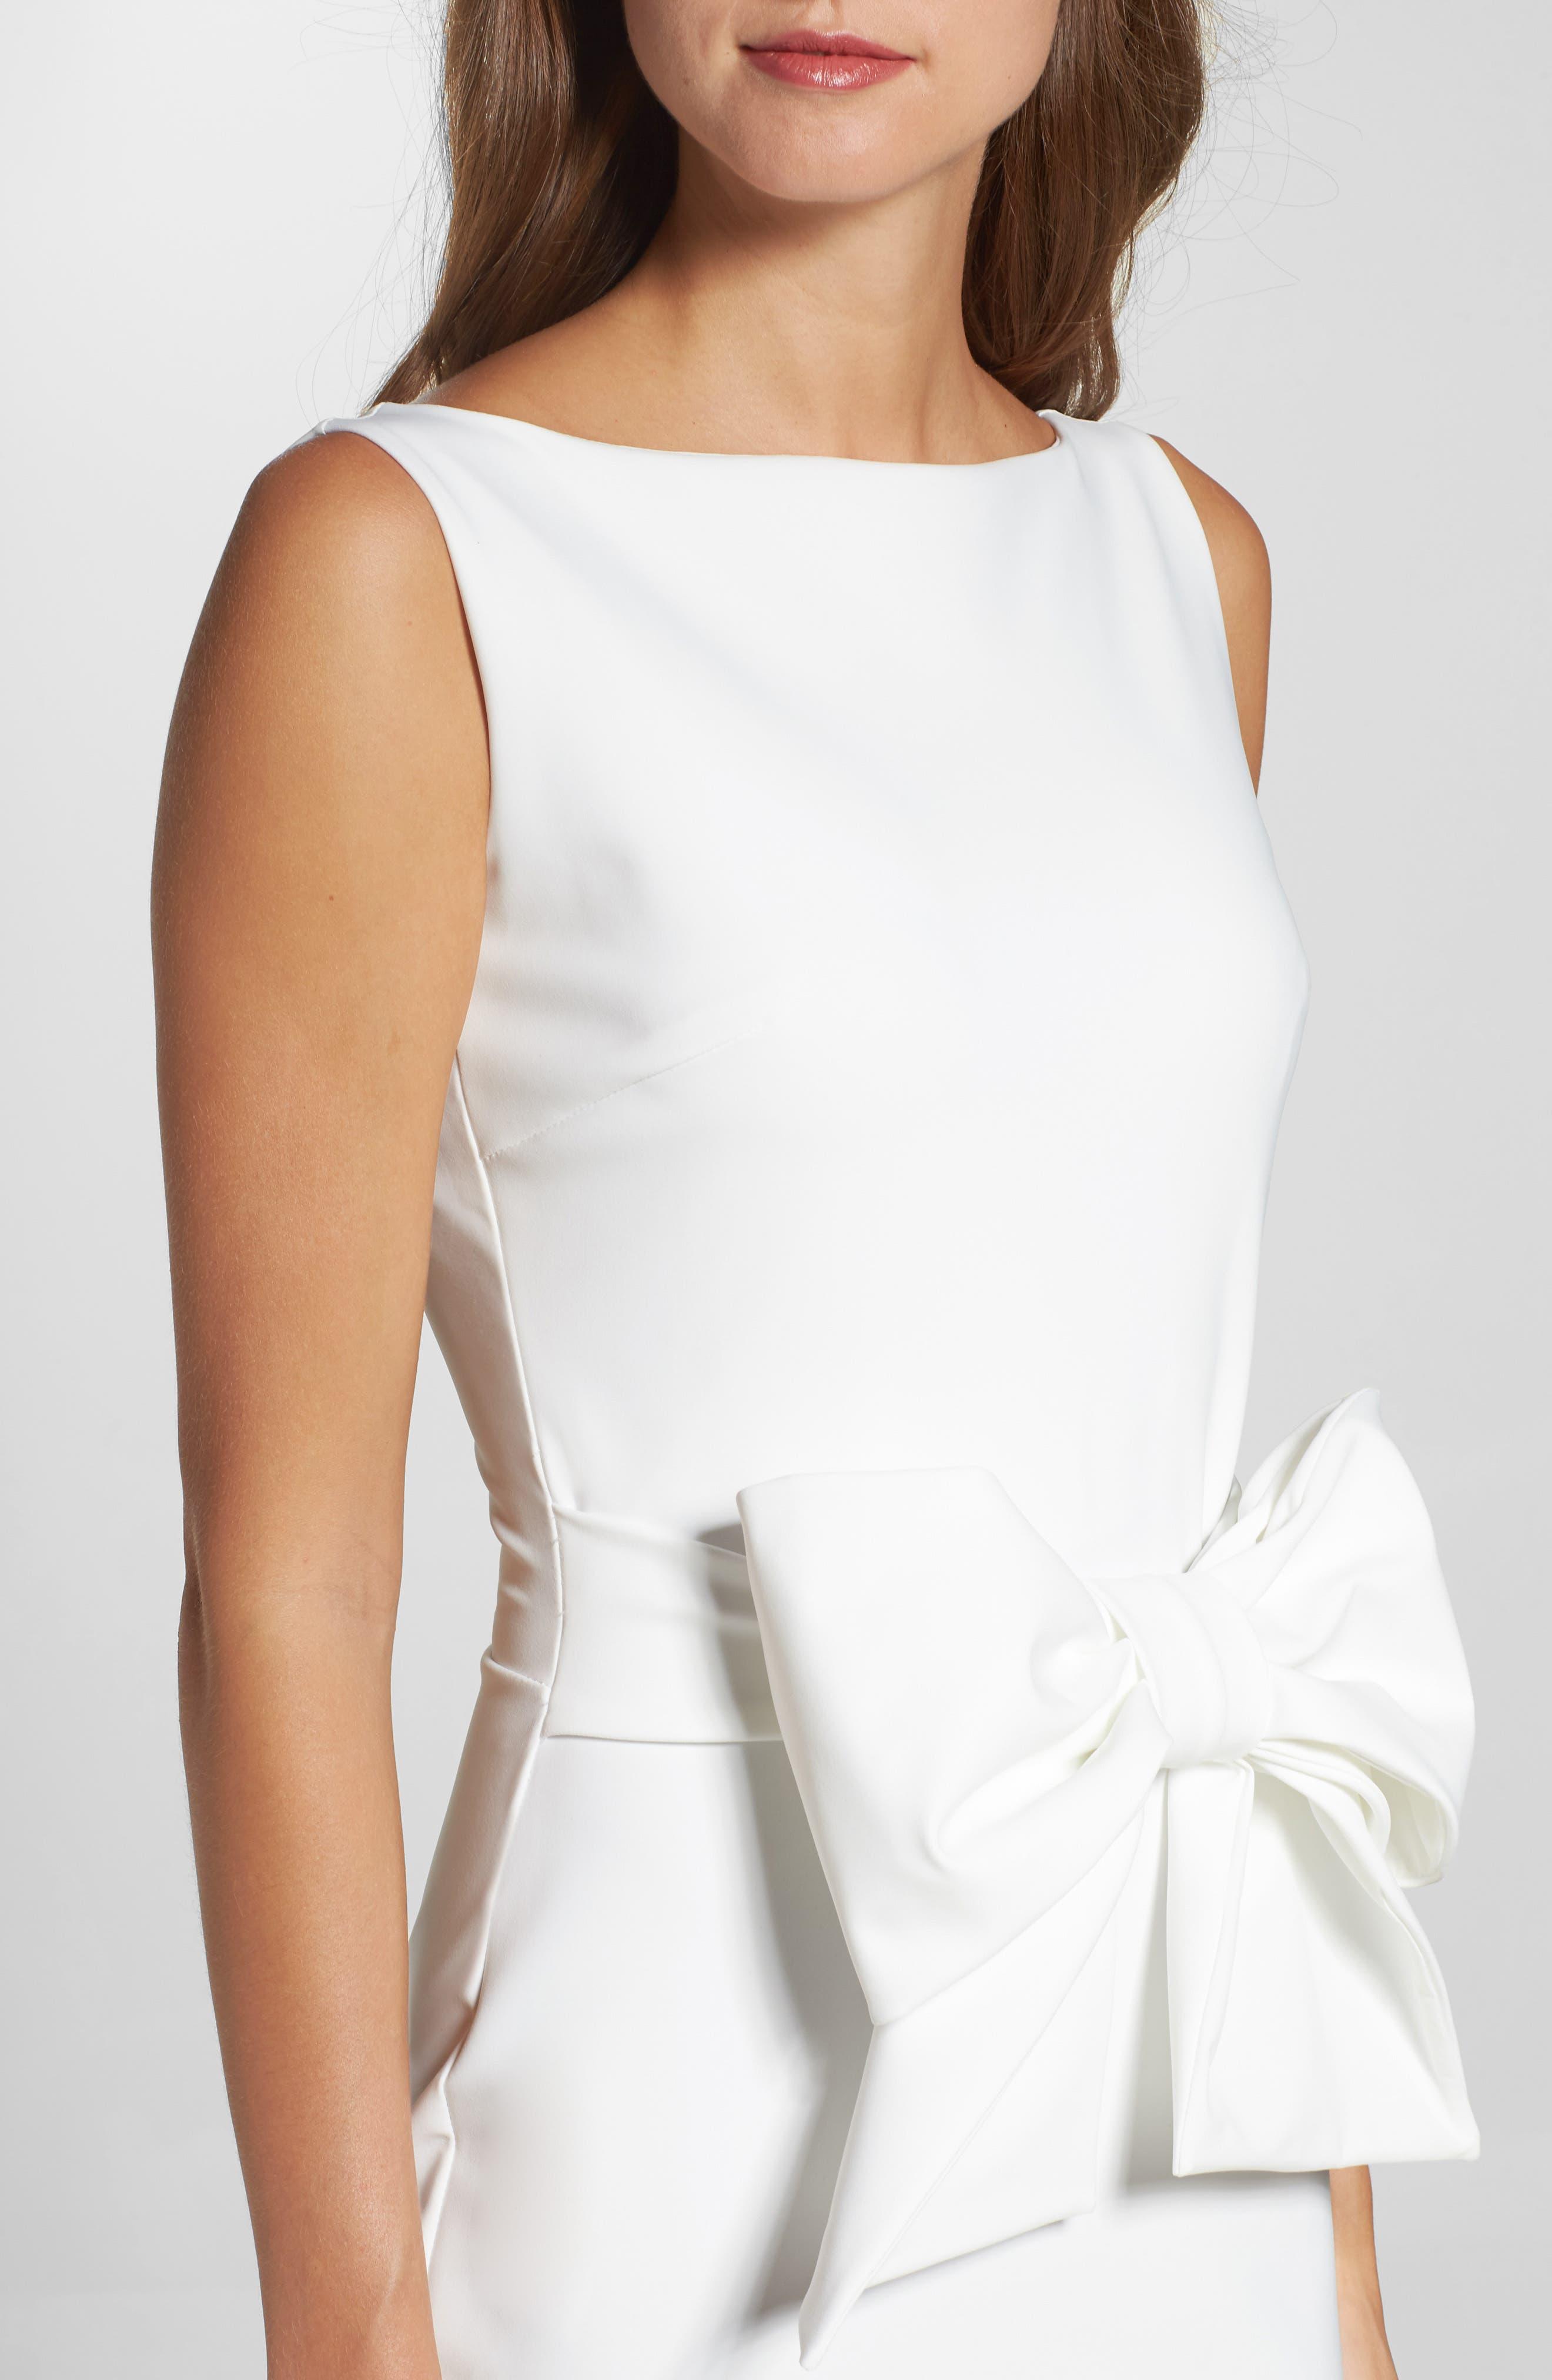 CHIARA BONI LA PETITE ROBE,                             Bow Detail Sleeveless Gown,                             Alternate thumbnail 4, color,                             100